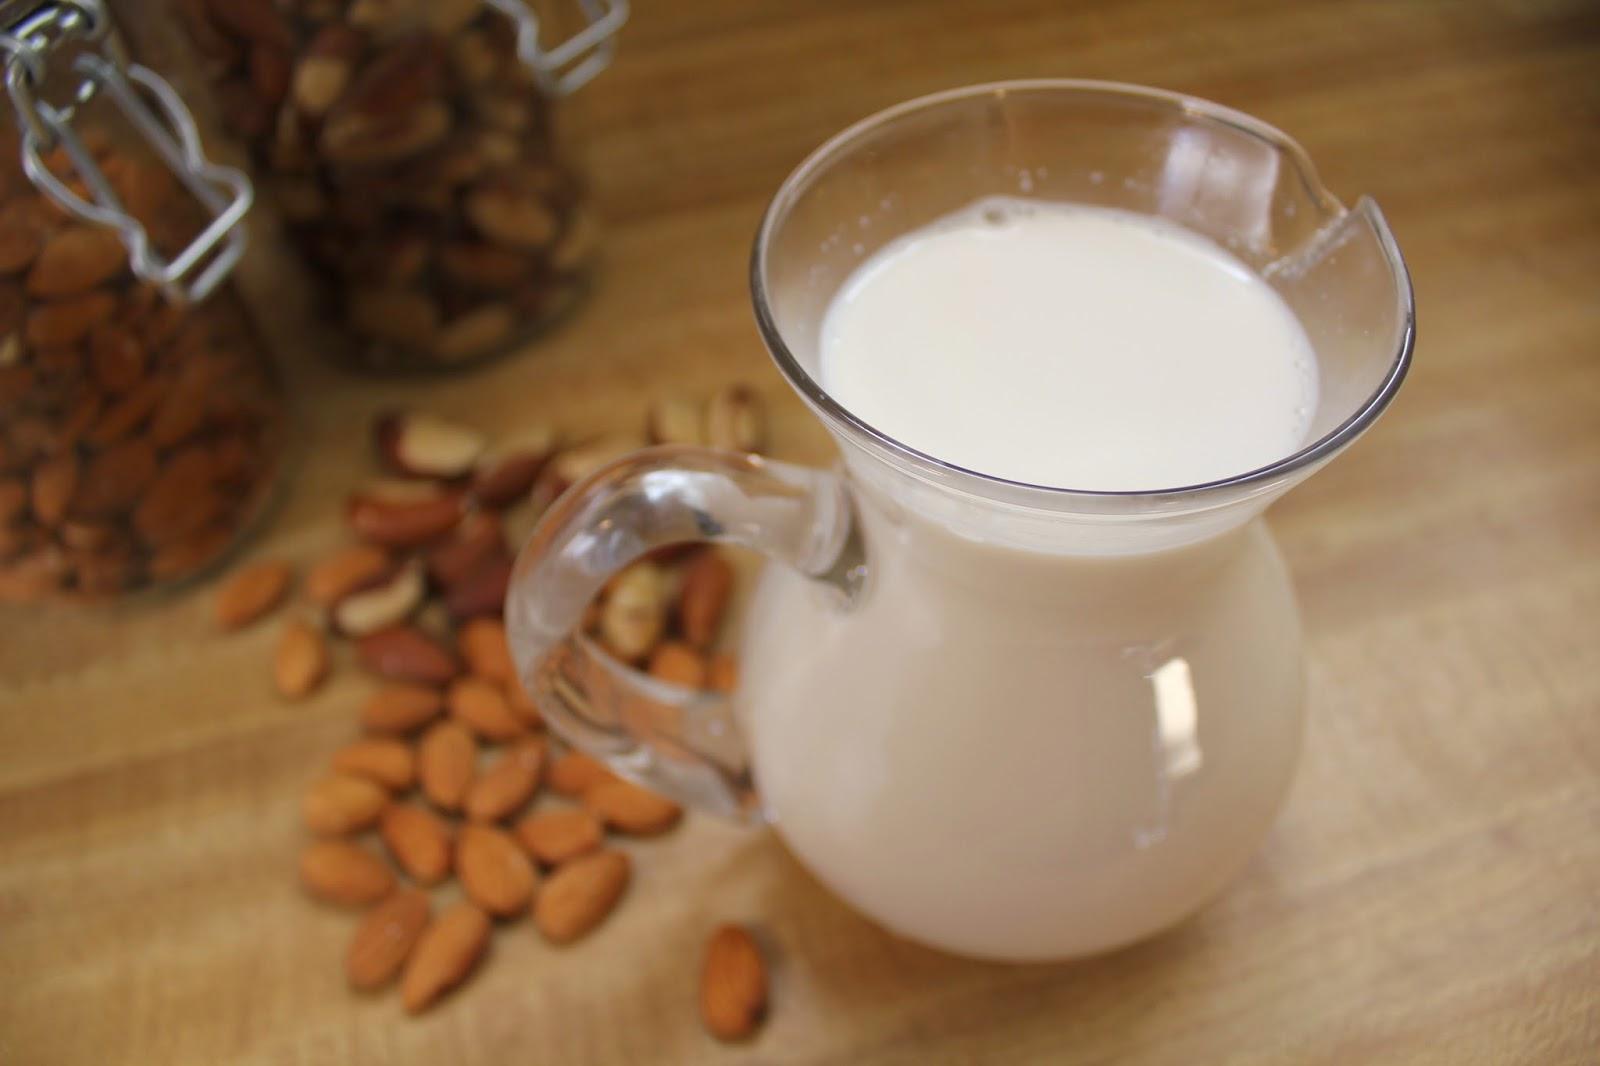 Making Fresh Almond Milk